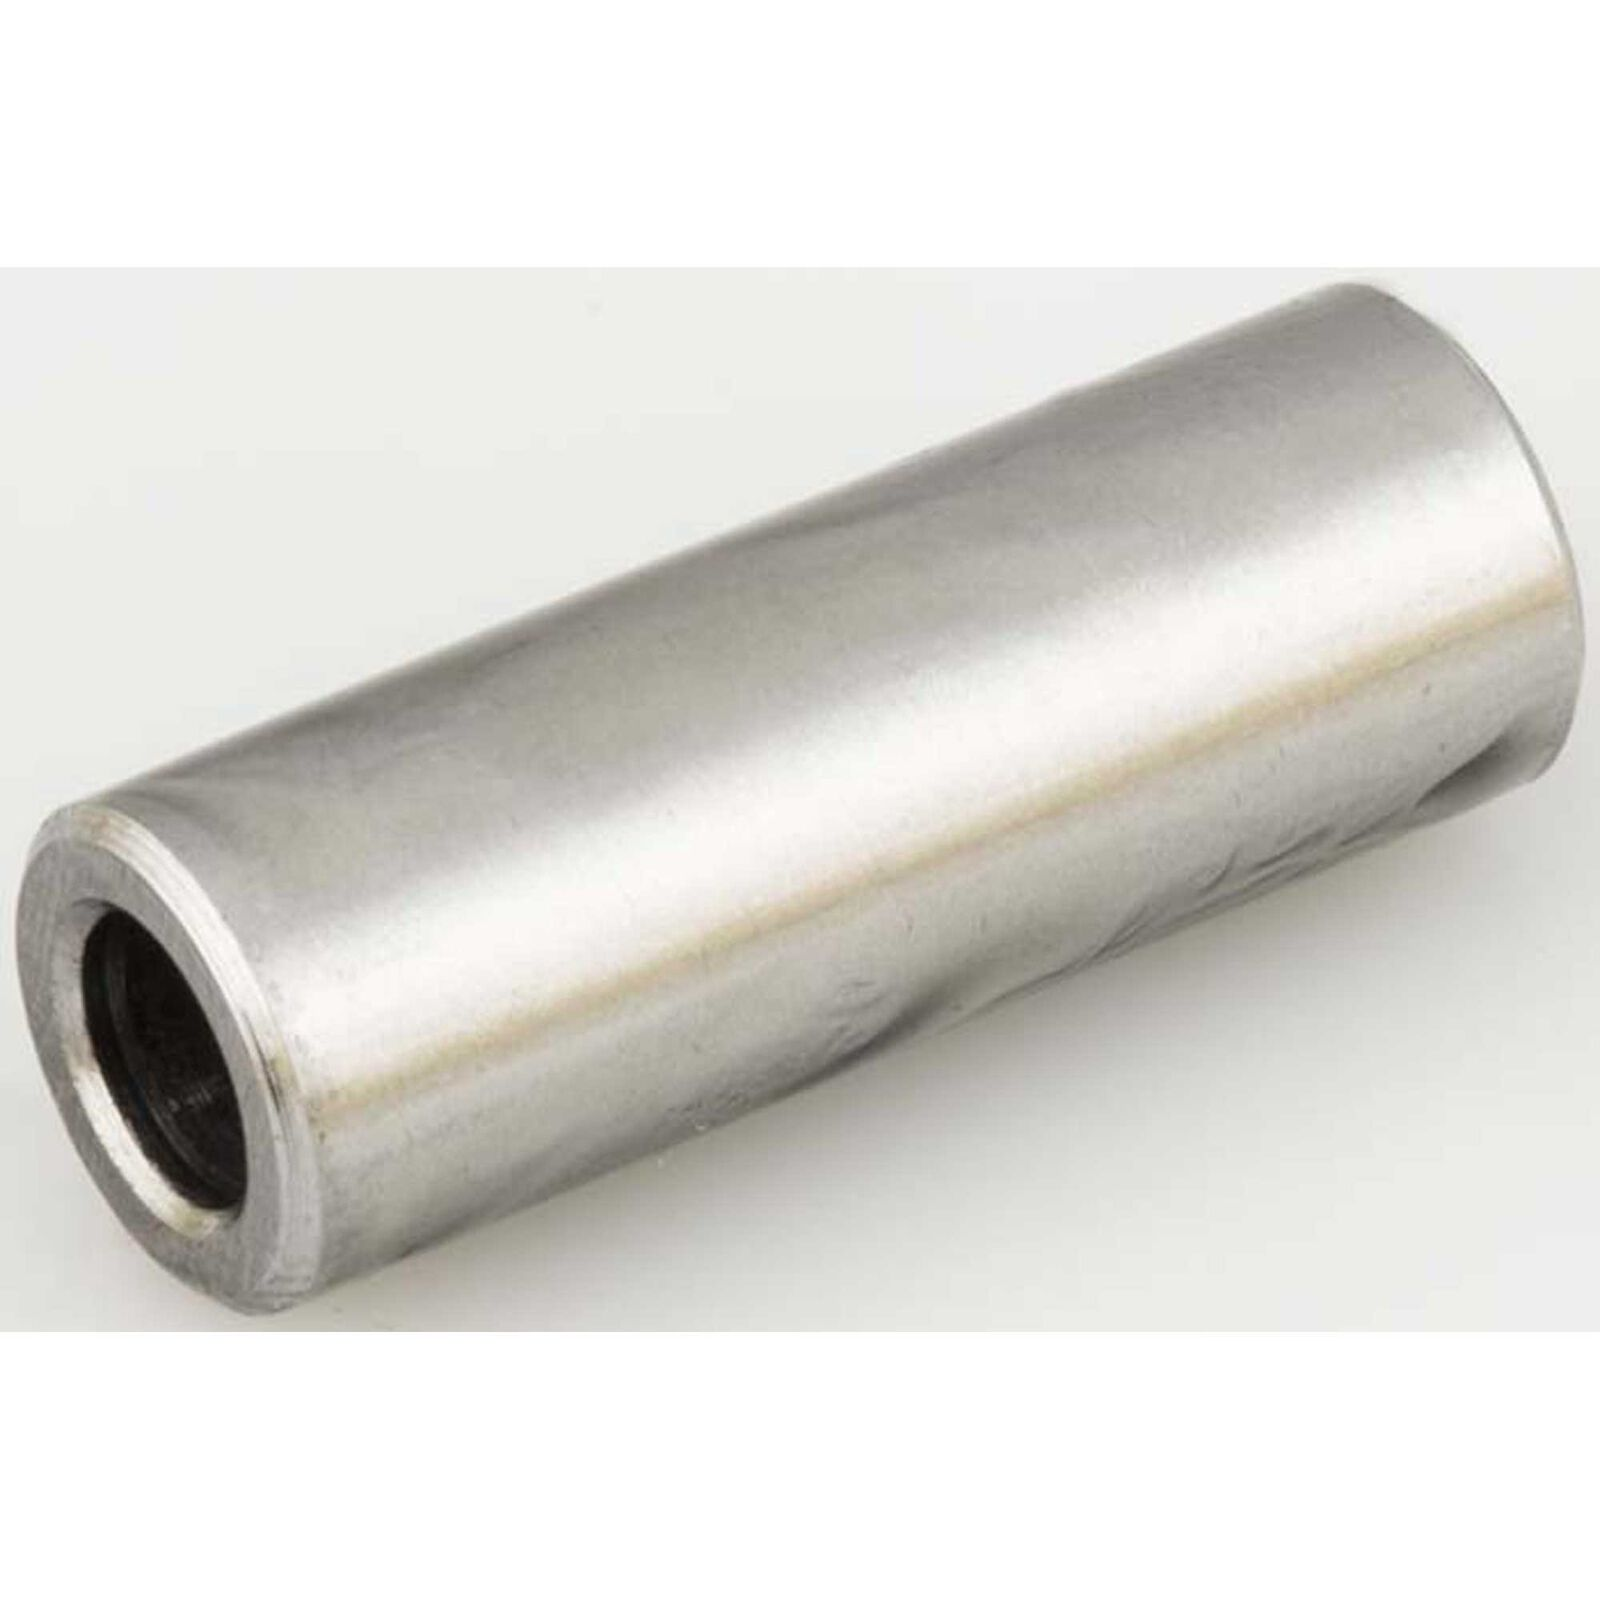 Piston Pin: DLE-40